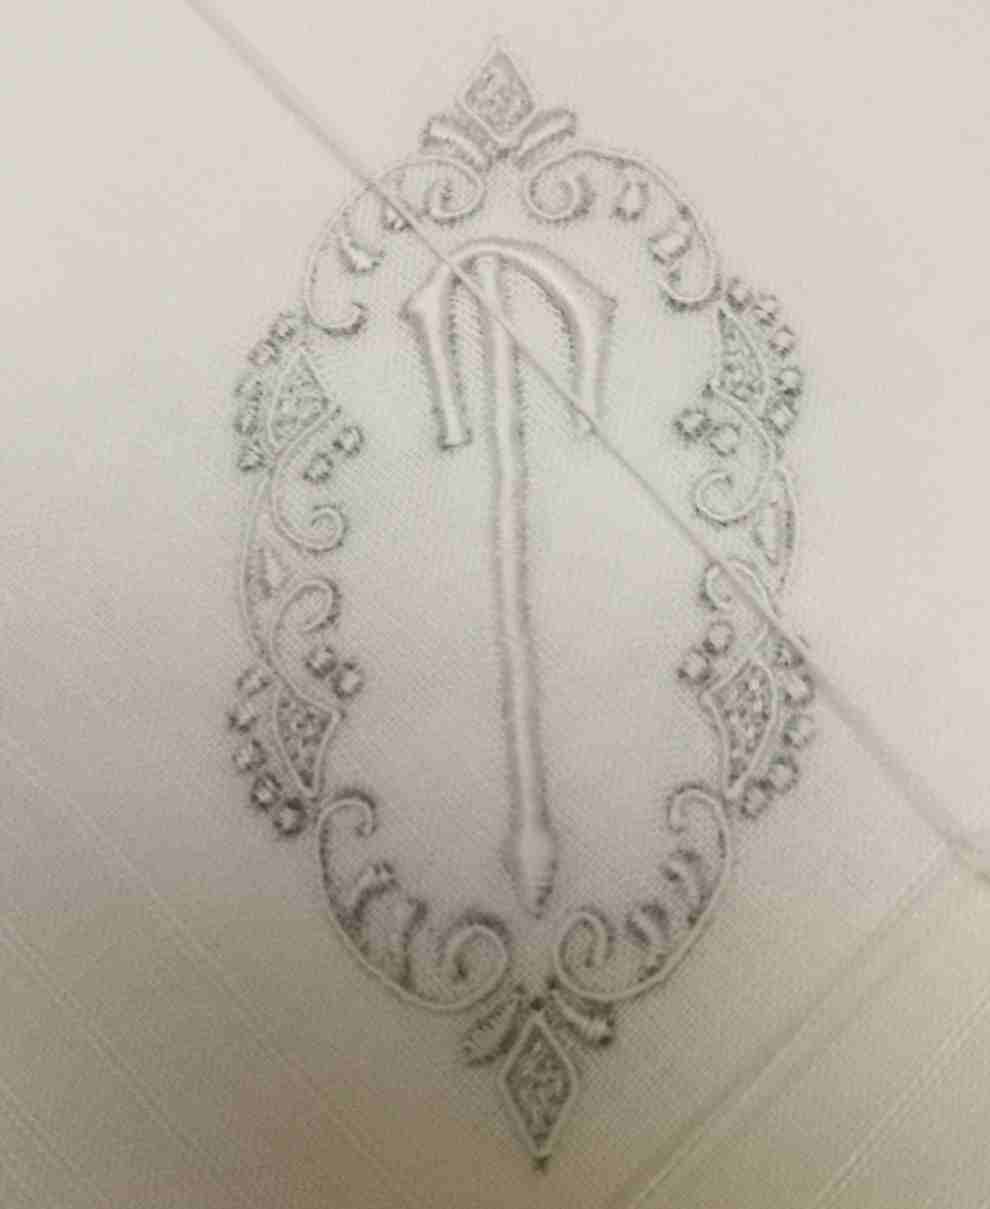 Set Of 12 Fashion Men's Monogrammed Handkerchiefs 16.5x16.5